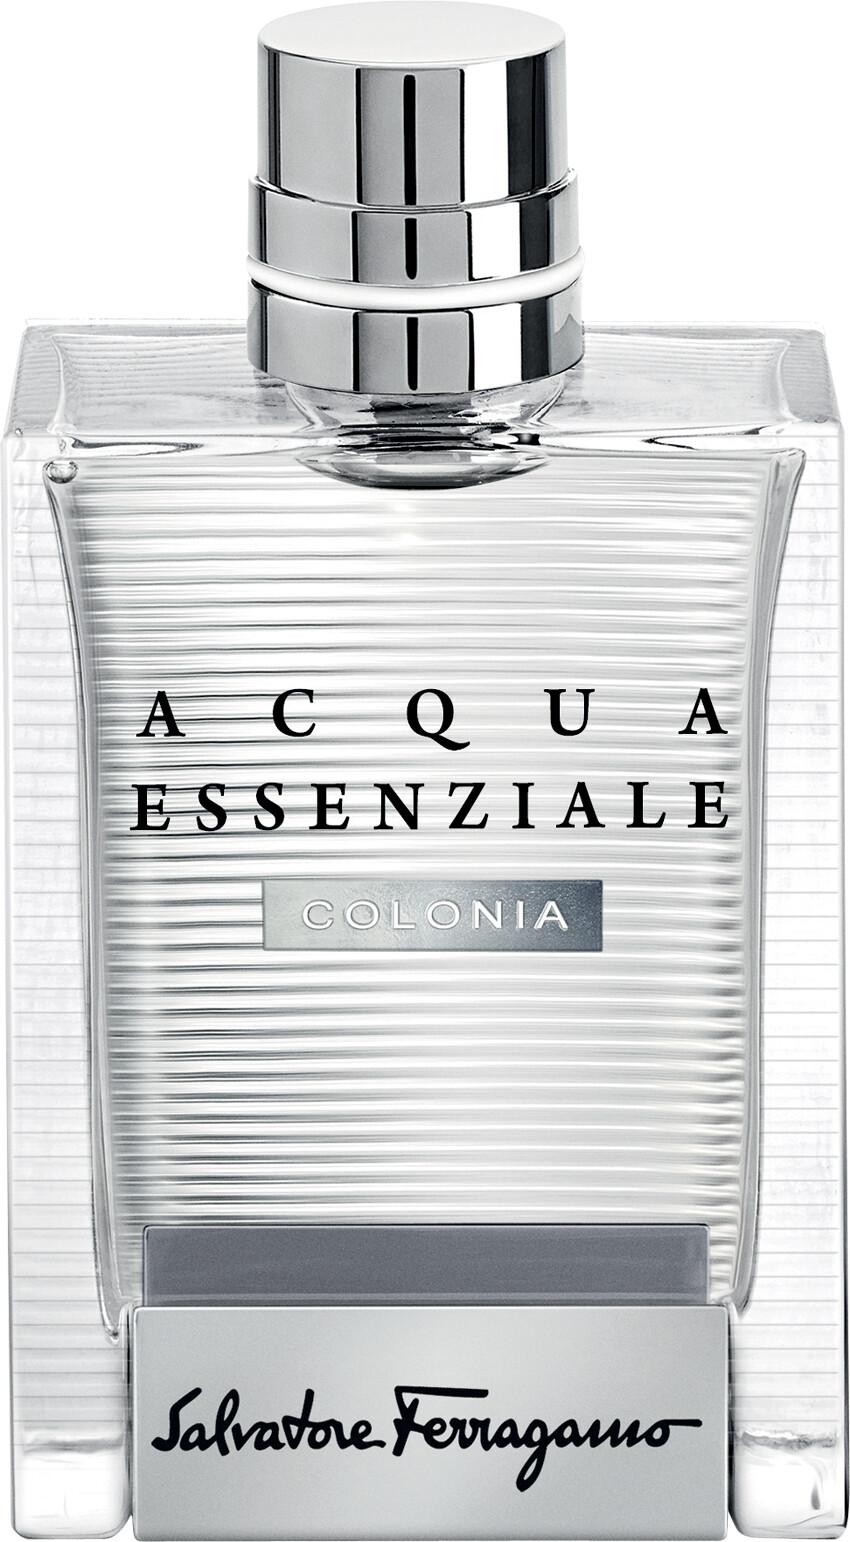 Salvatore Ferragamo Acqua Essenziale Colonia Eau de..